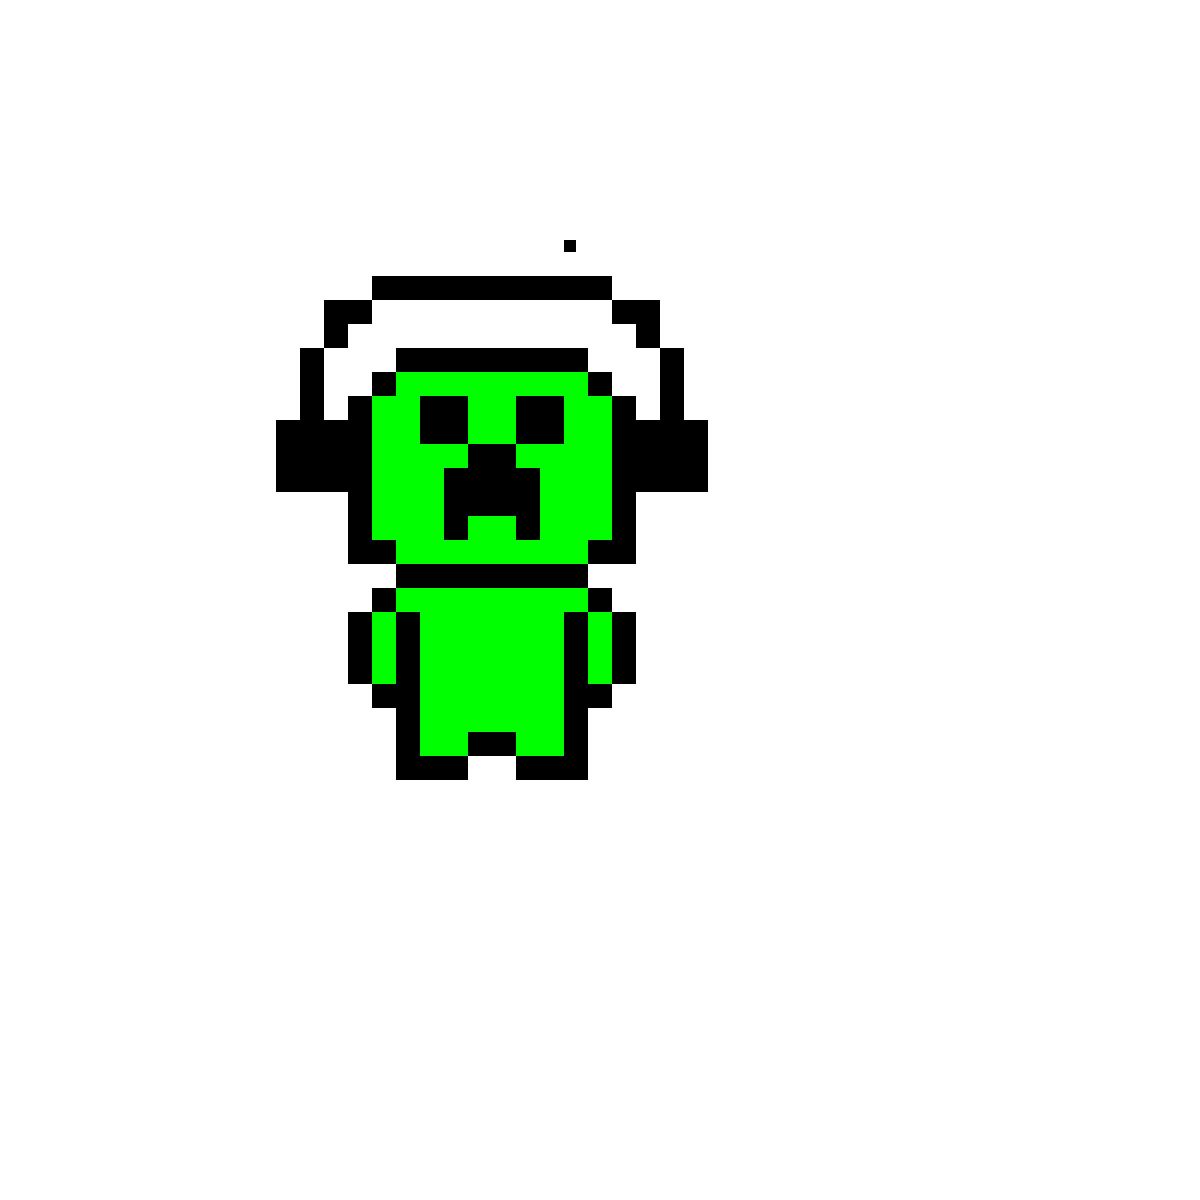 Creeper by yourmomdotcom